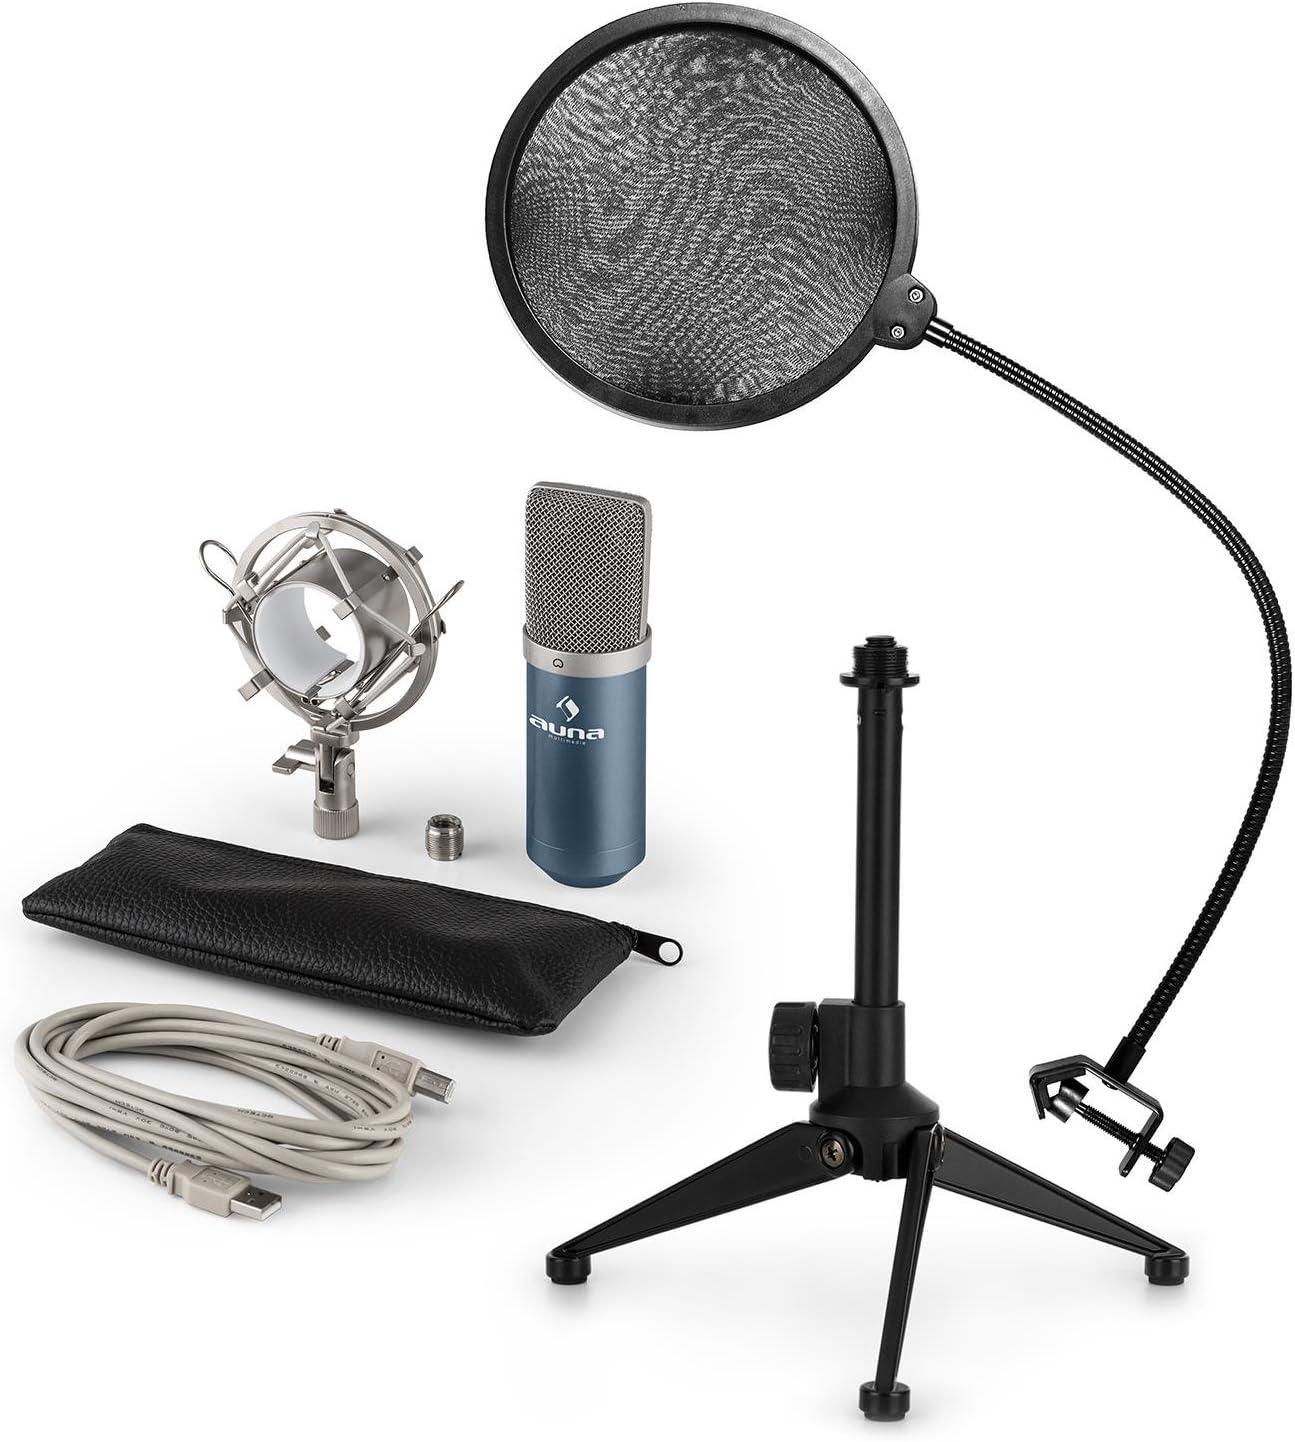 3-teilig H/öhenverstellbar Popschutz 35cm Schwanenhals auna MIC-900S-LED Plug /& Play Mikrofon-Set V2 silber USB Kondensatormikrofon Nierencharakteristik Mikrofon-Tischst/änder